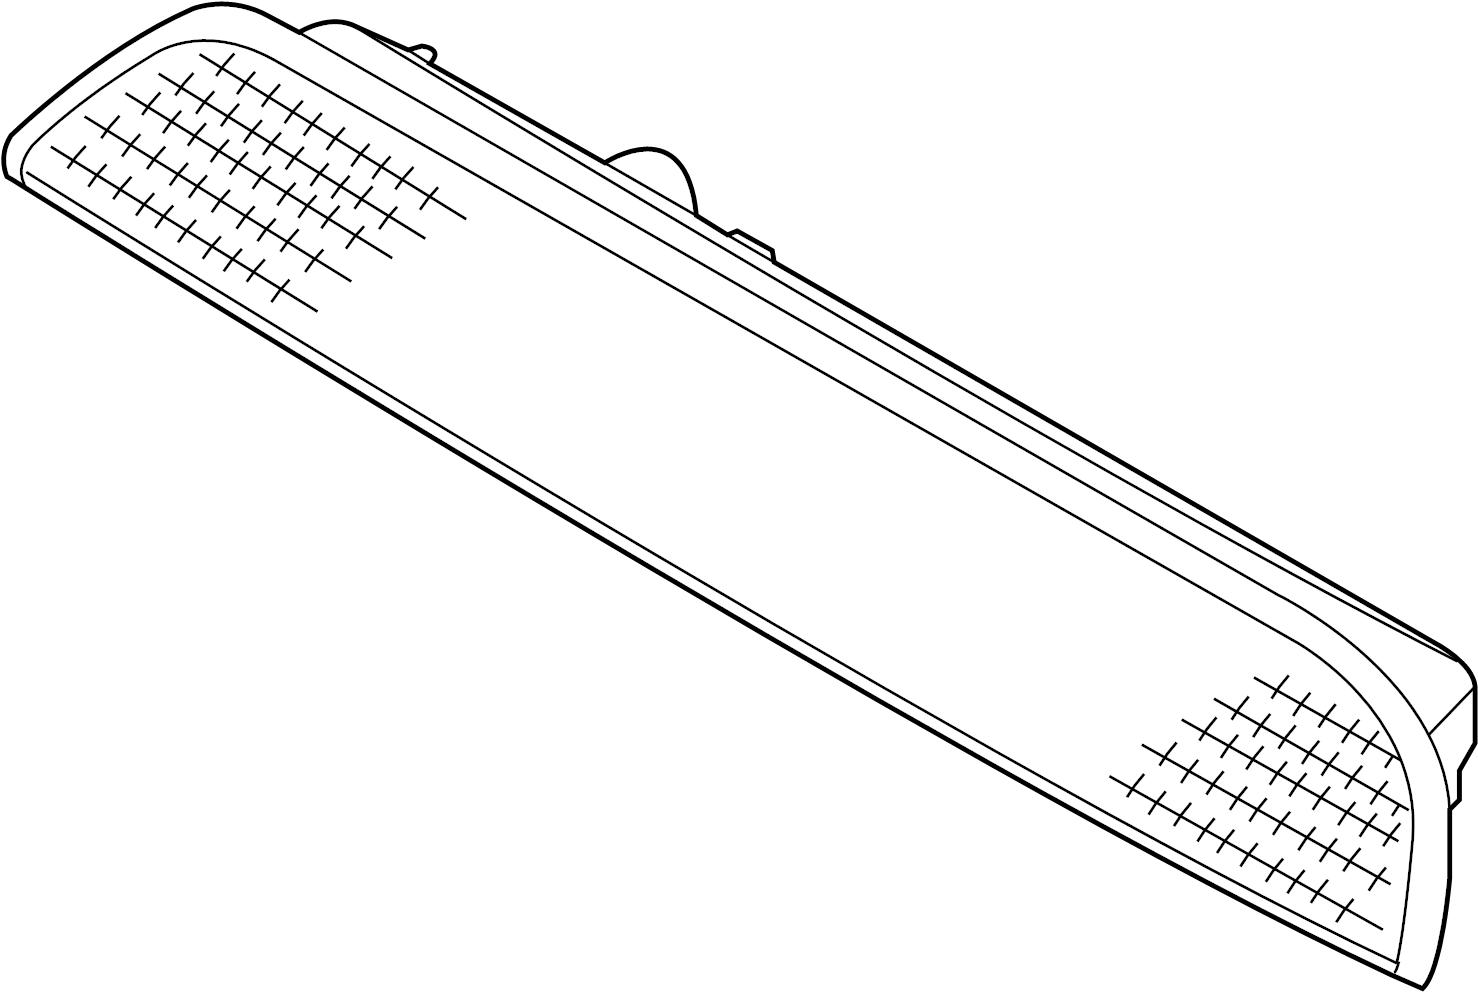 kia sedona center high mount stop light  lamp  rear